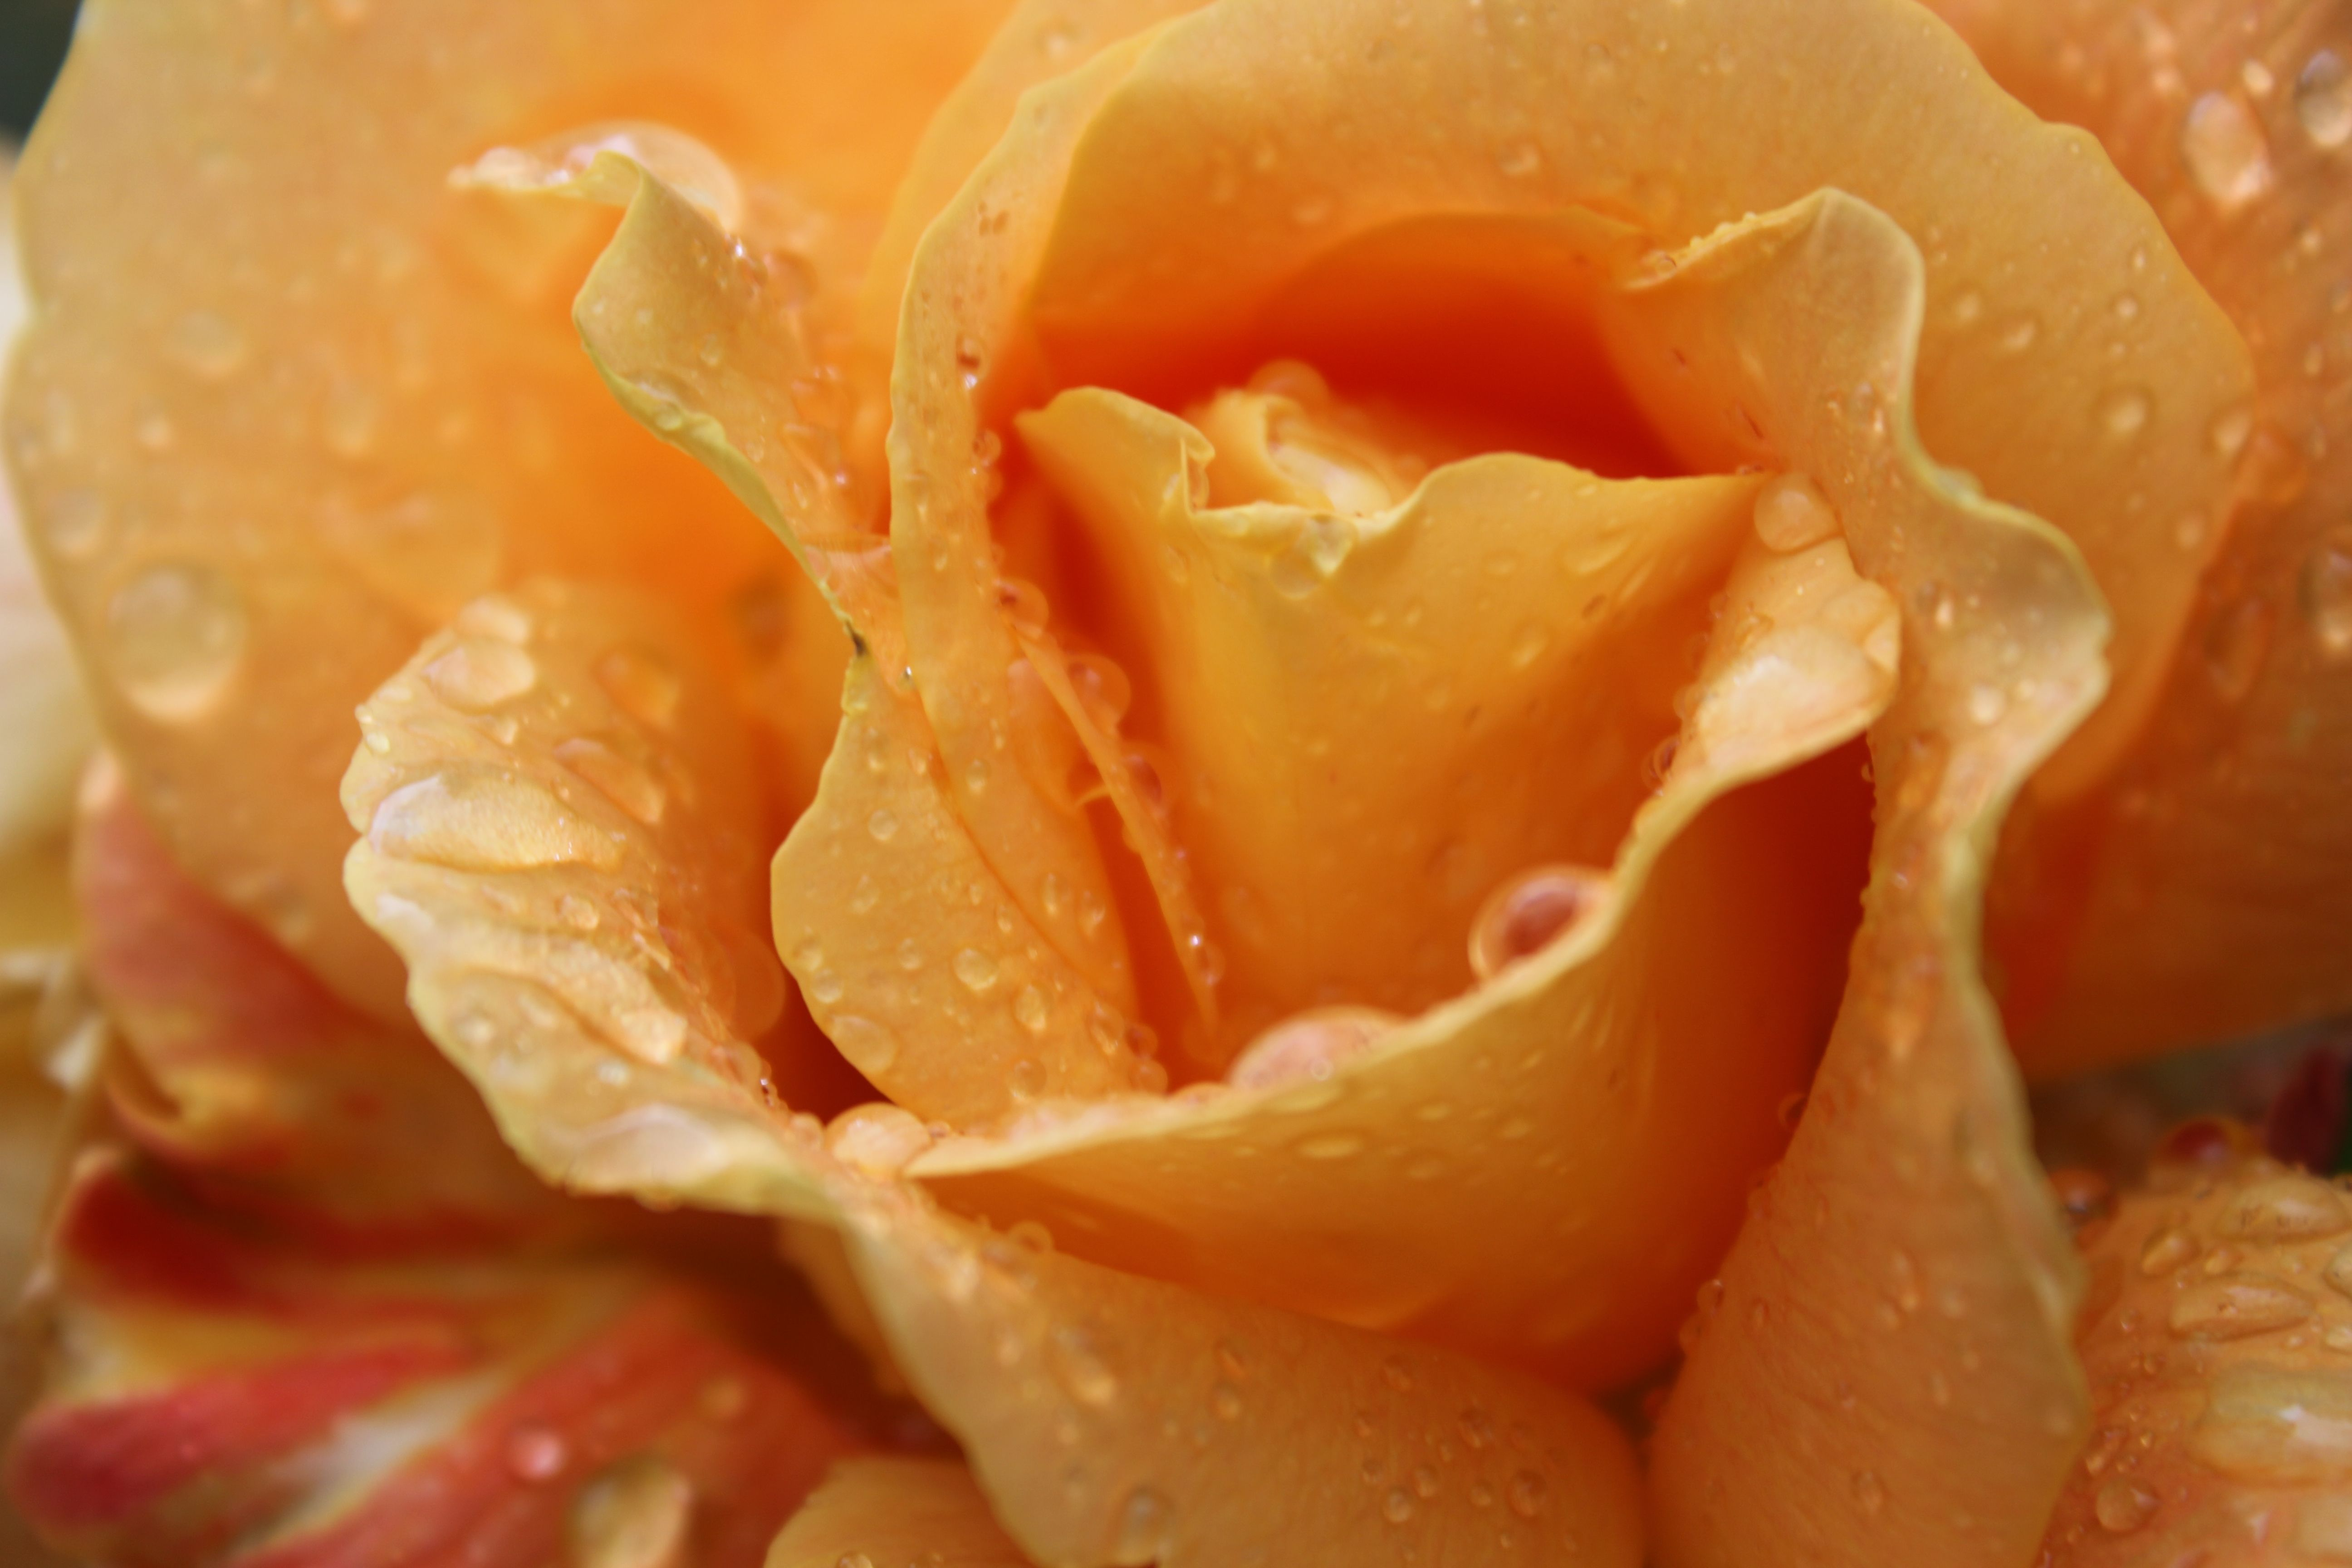 inside the orange rose